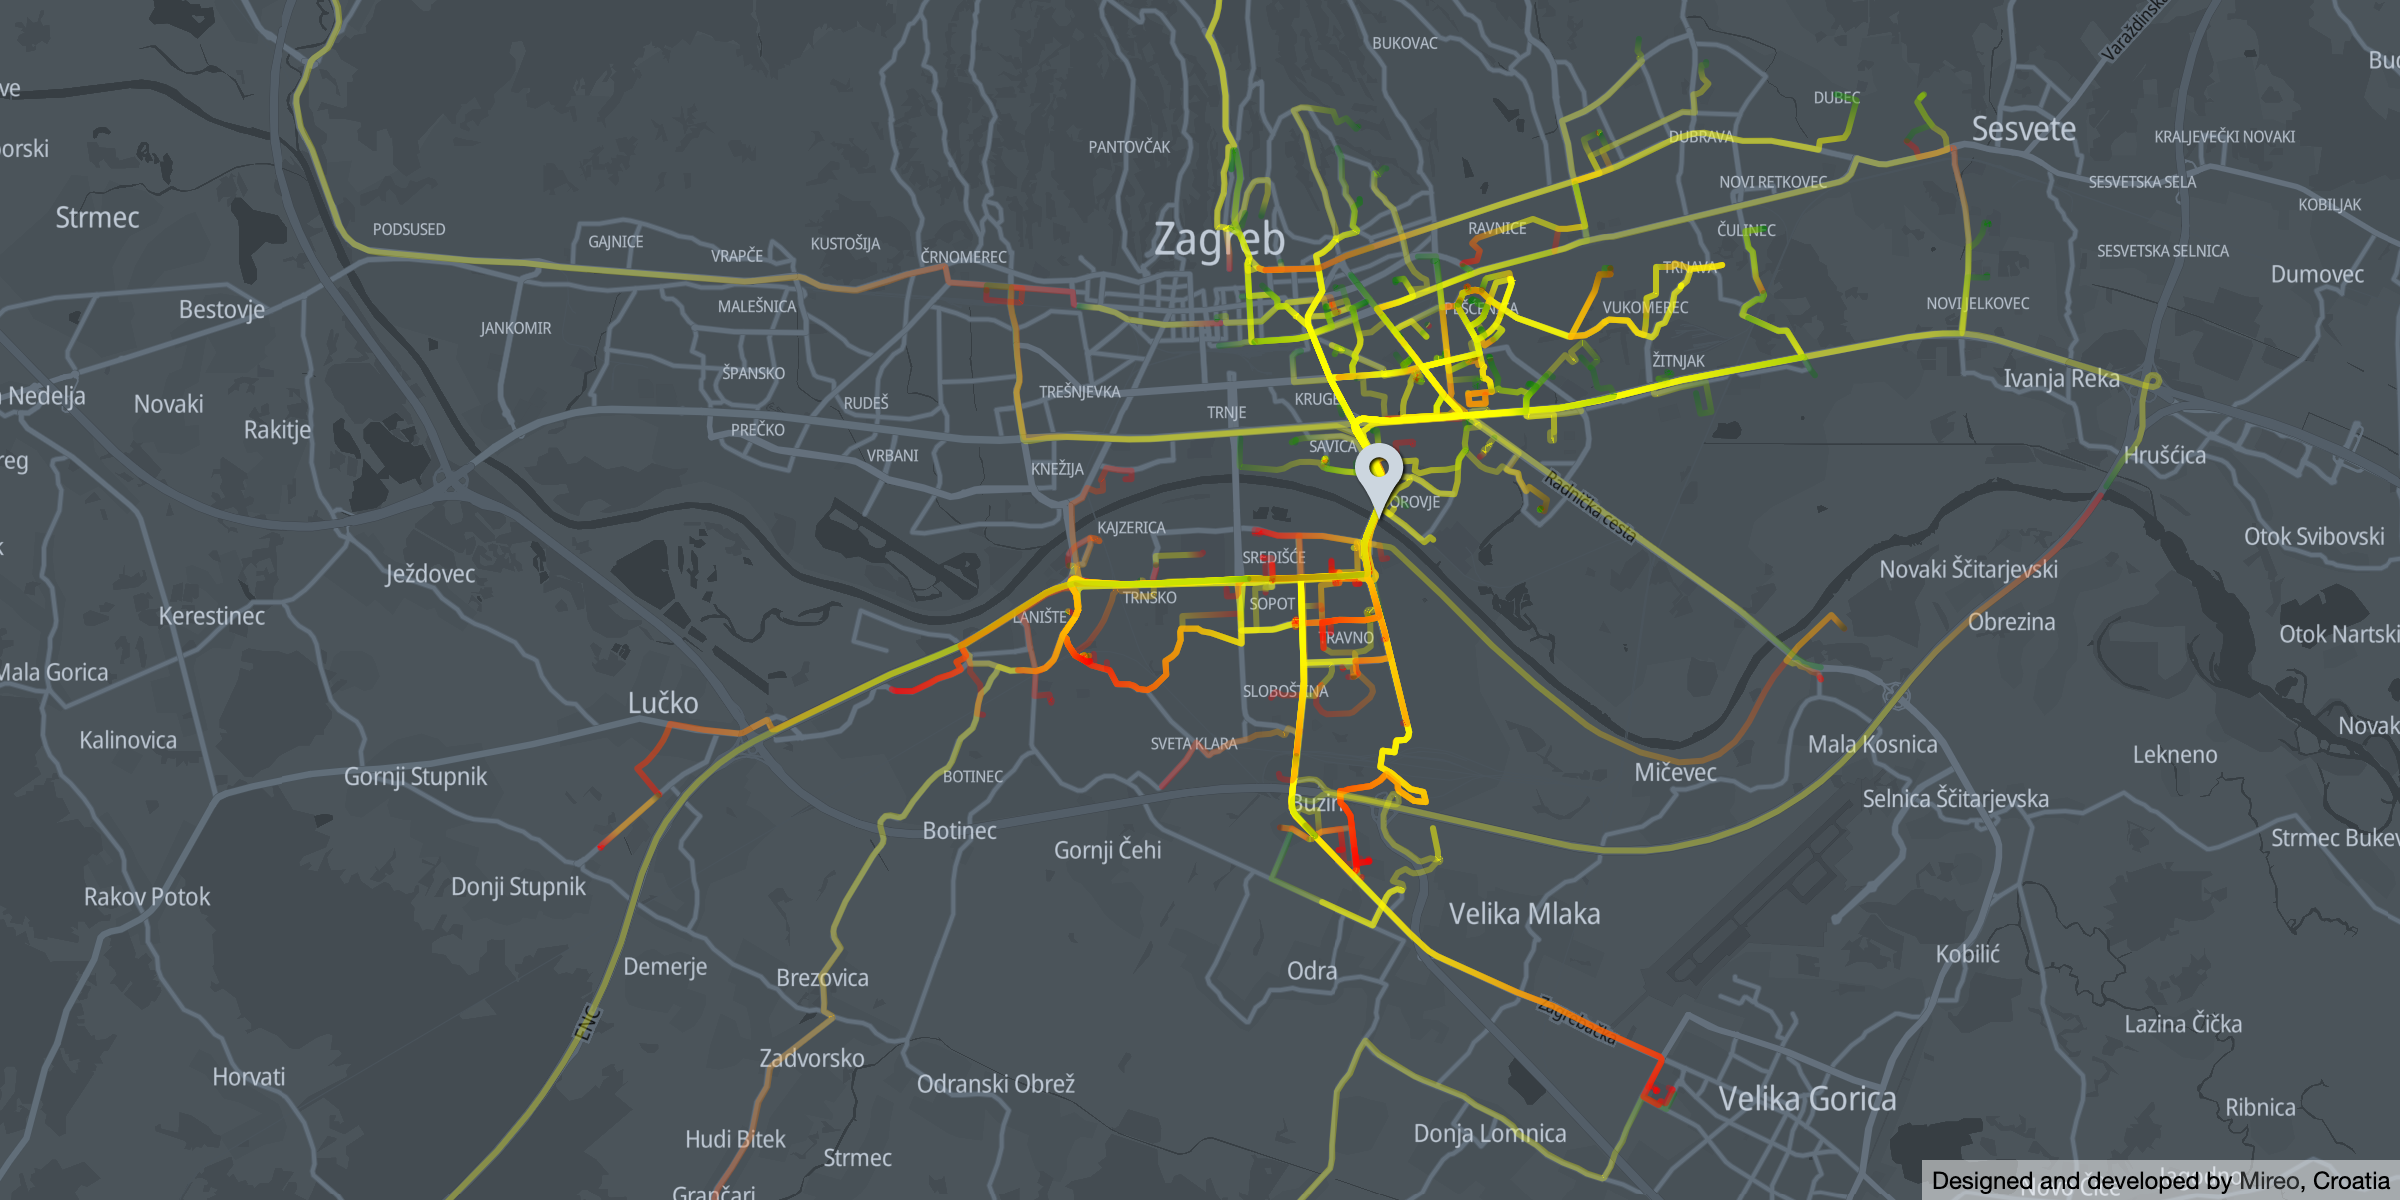 Morning traffic across Youth Bridge - direction south   Zagreb promet preko Mosta mladosti smjer jug